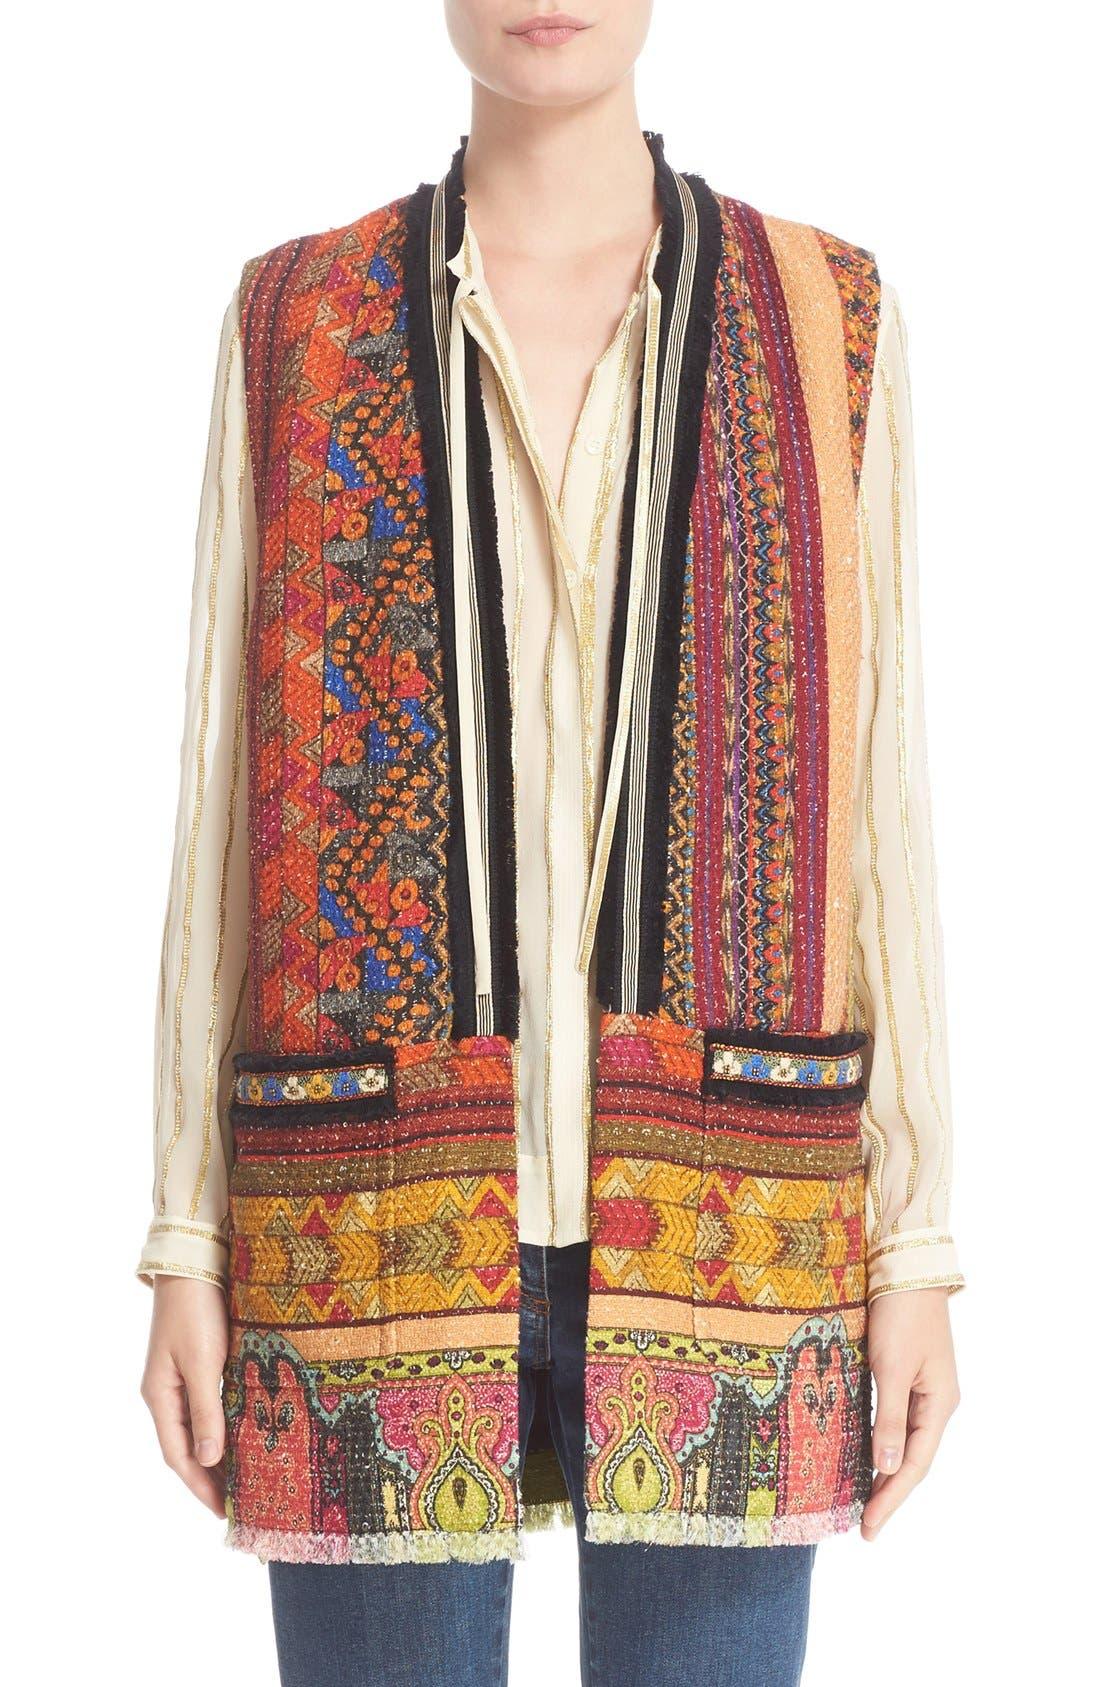 Alternate Image 1 Selected - Etro Ribbon Print Cotton Blend Vest